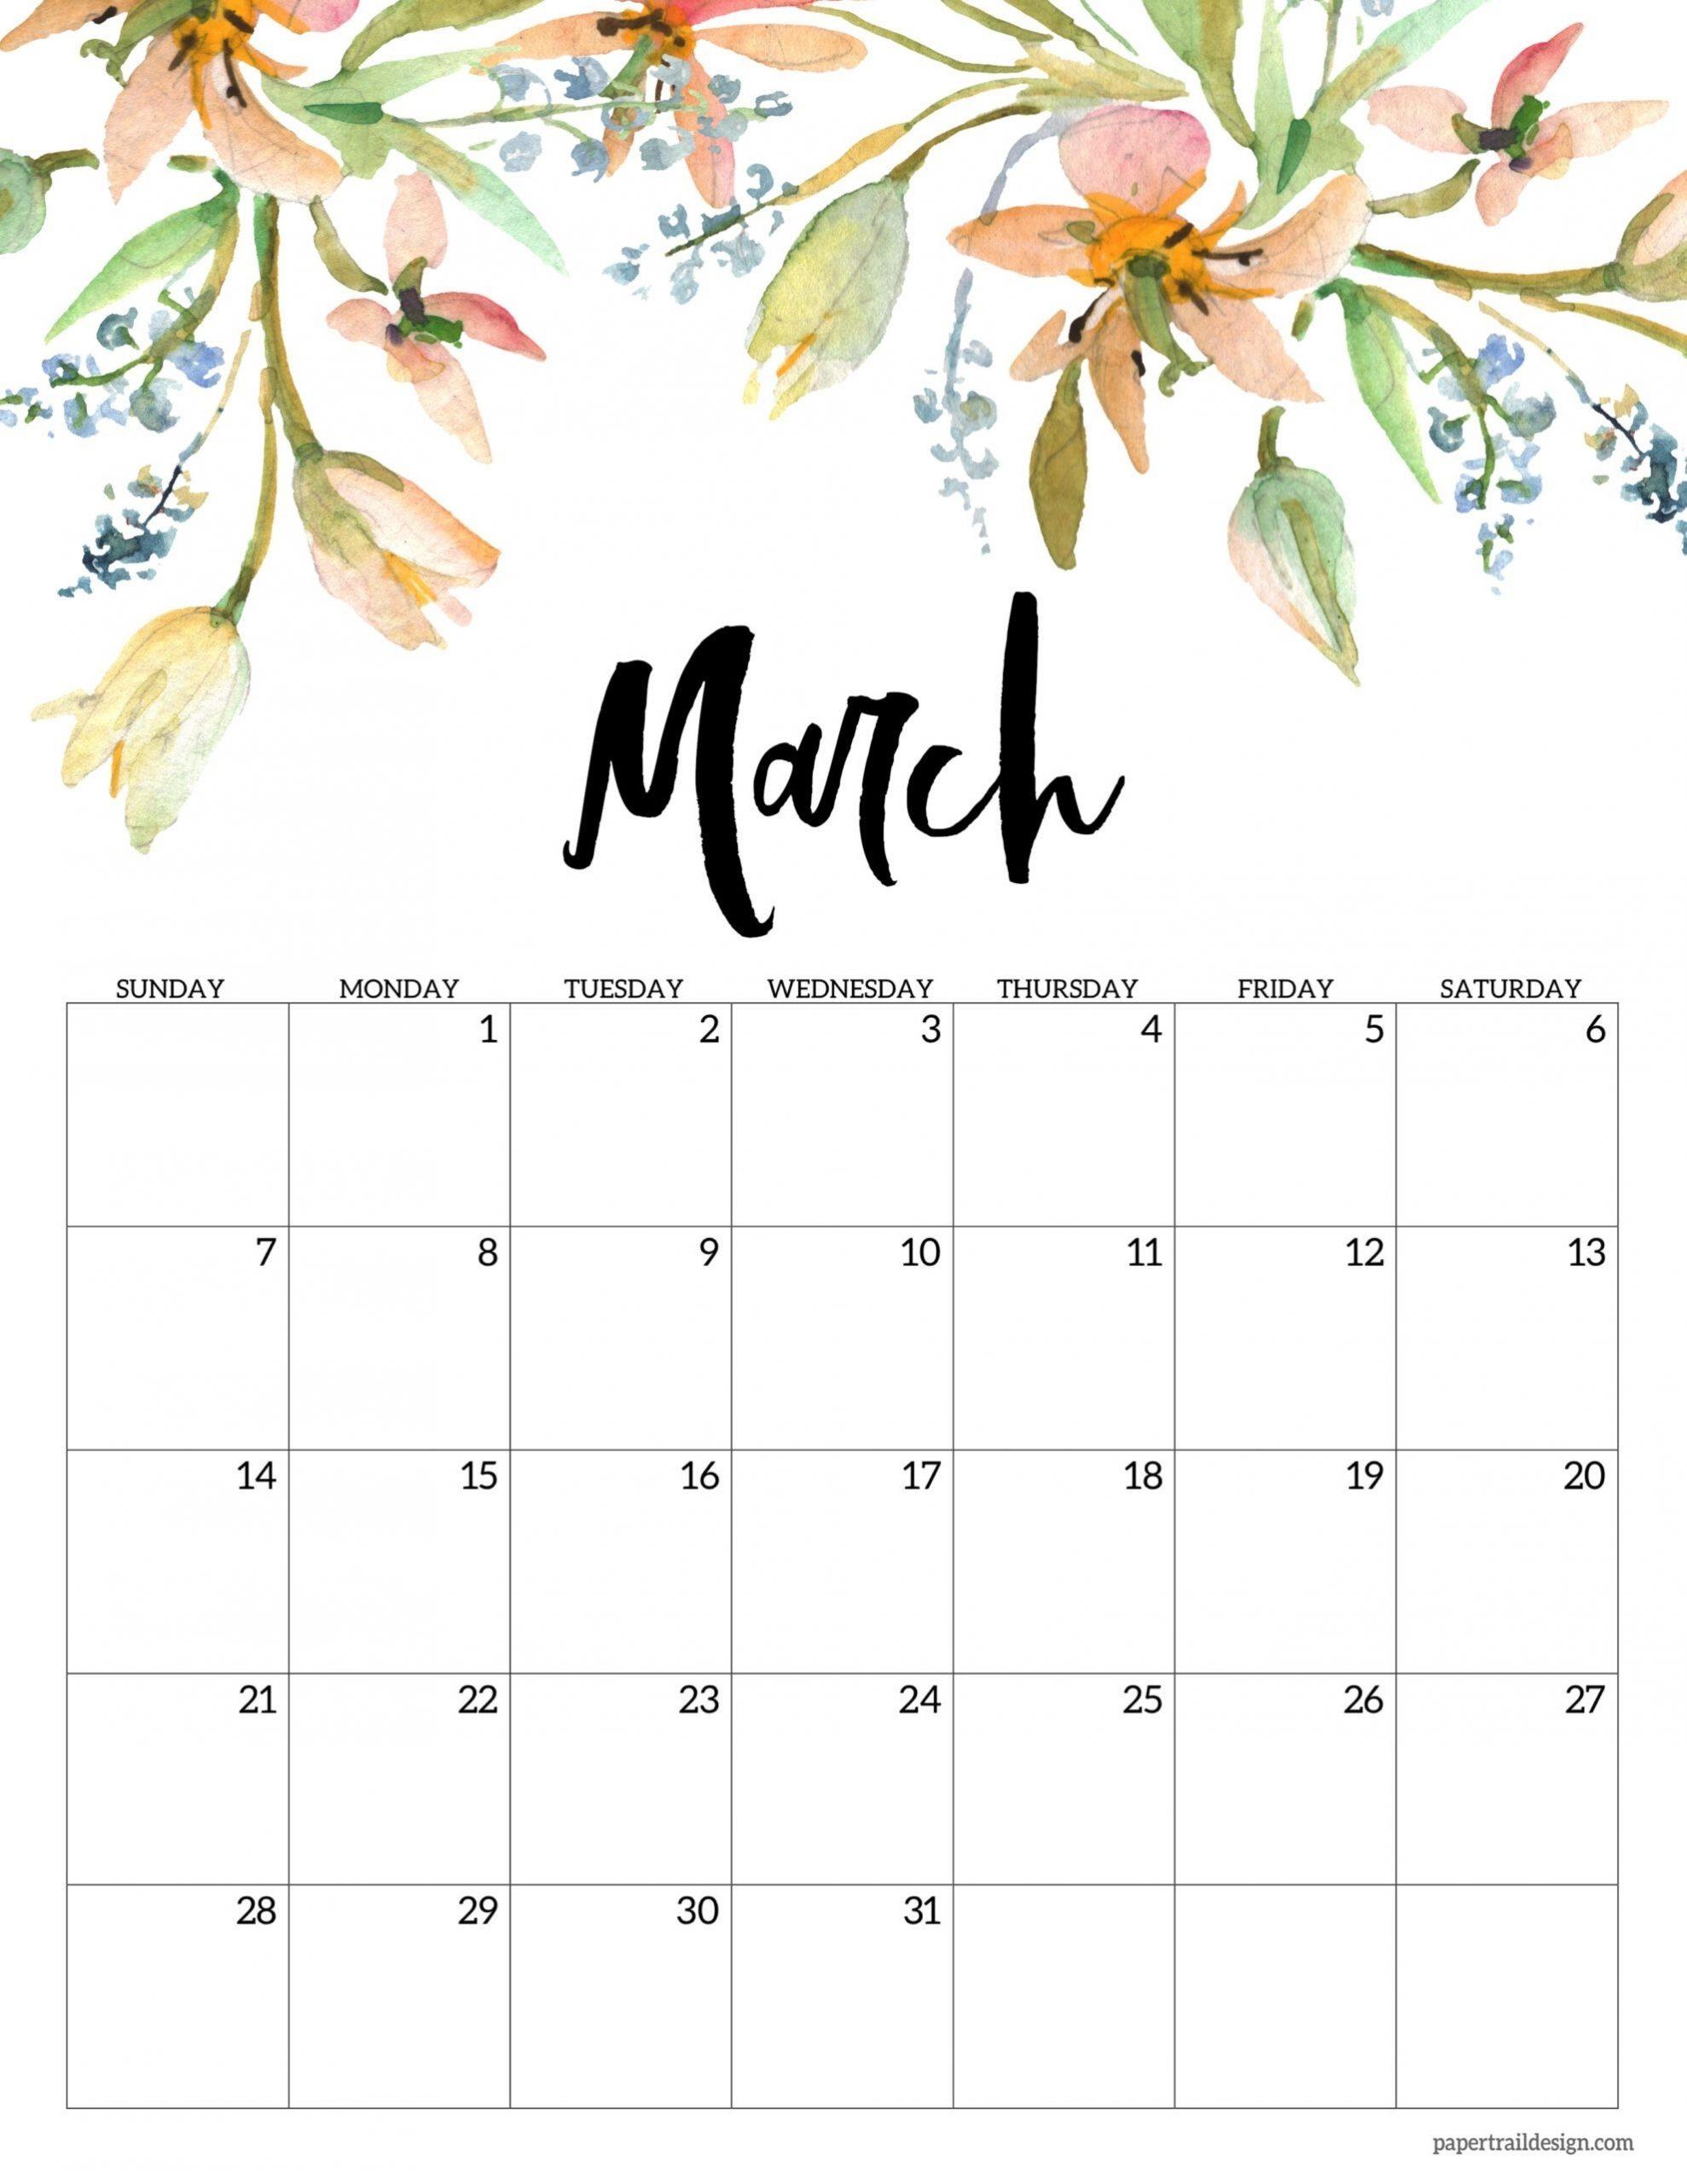 Catch 2021 Cute Calendar Printable Free